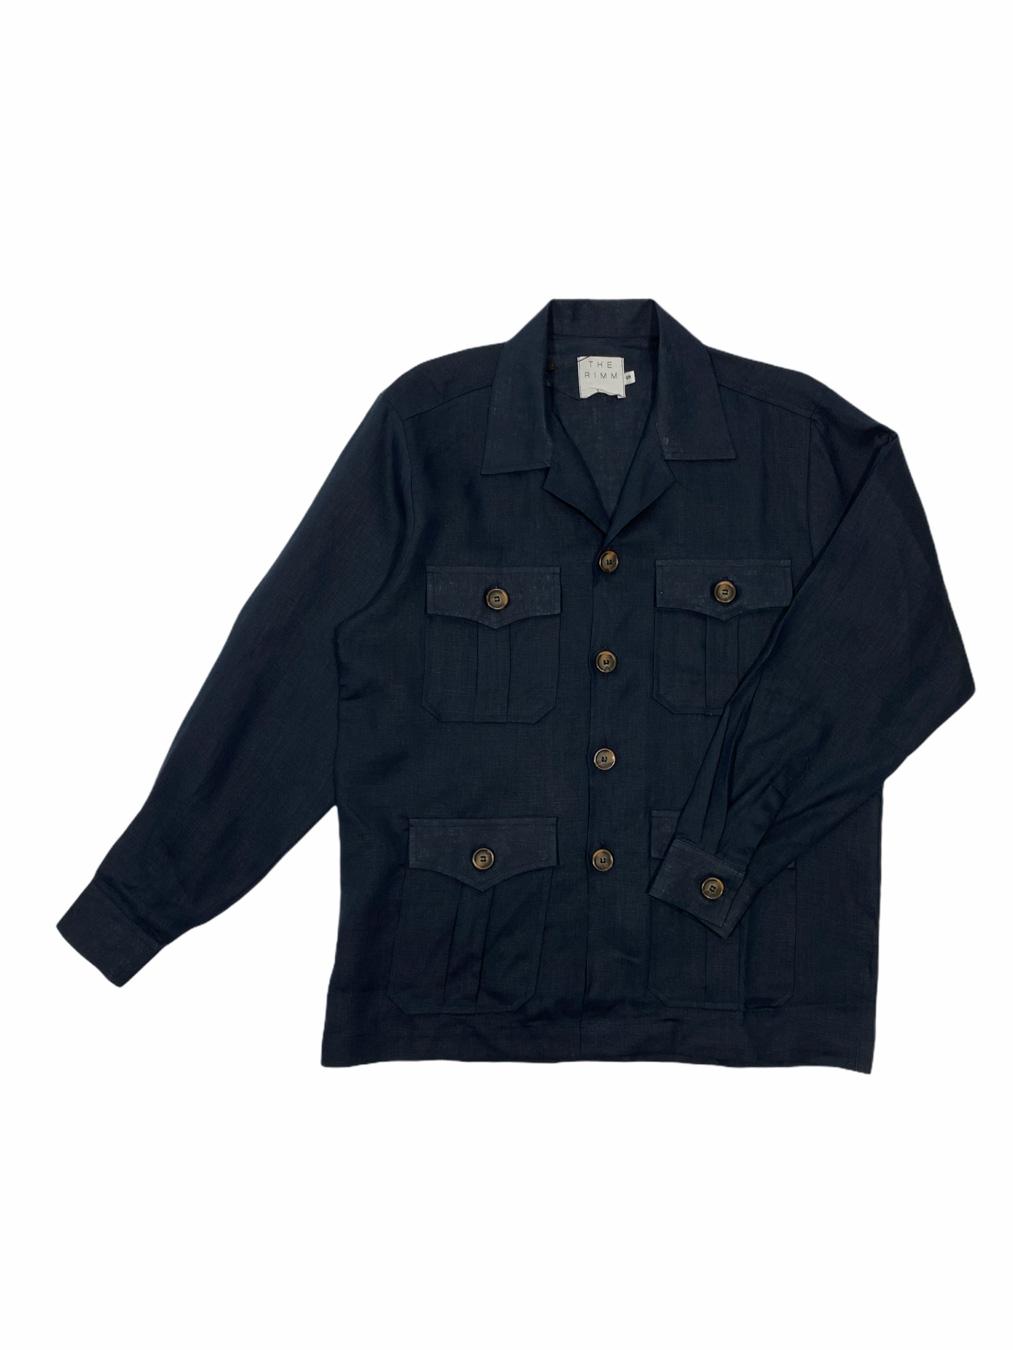 Linen Field Jackets (Navy)